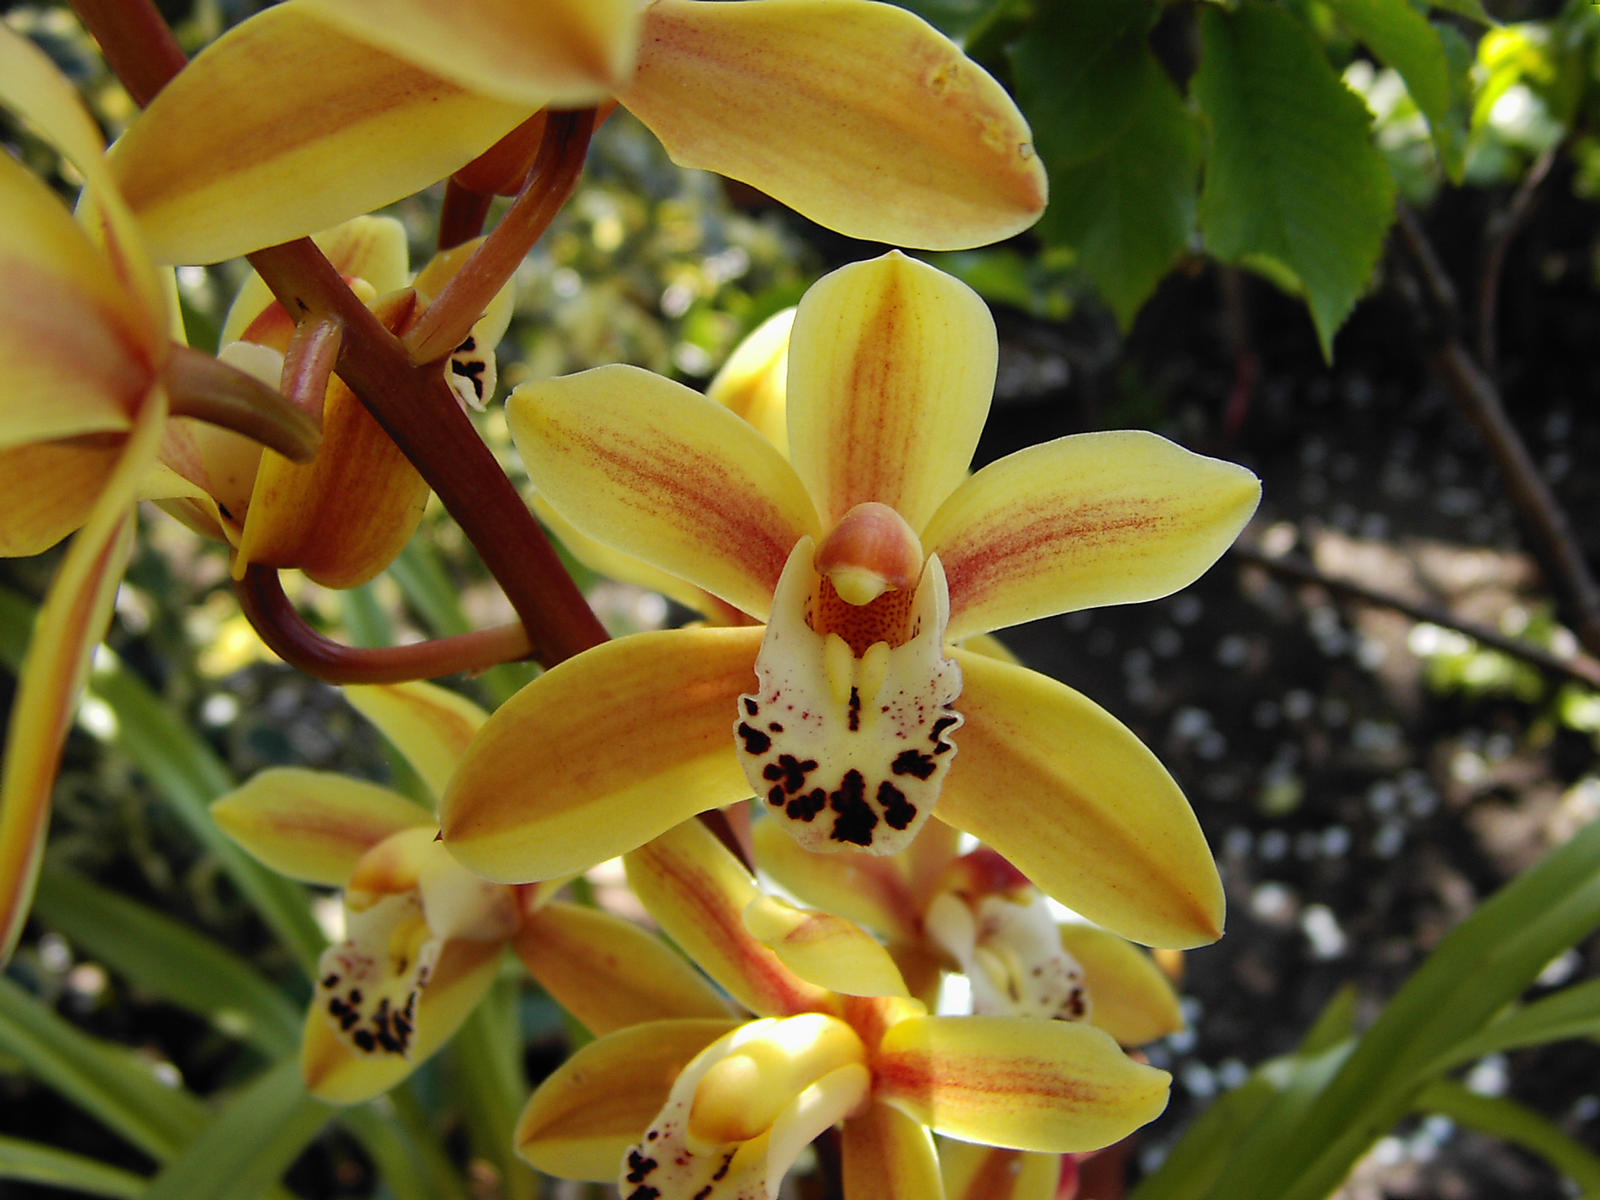 Cymbidium flowers by GrahamSym